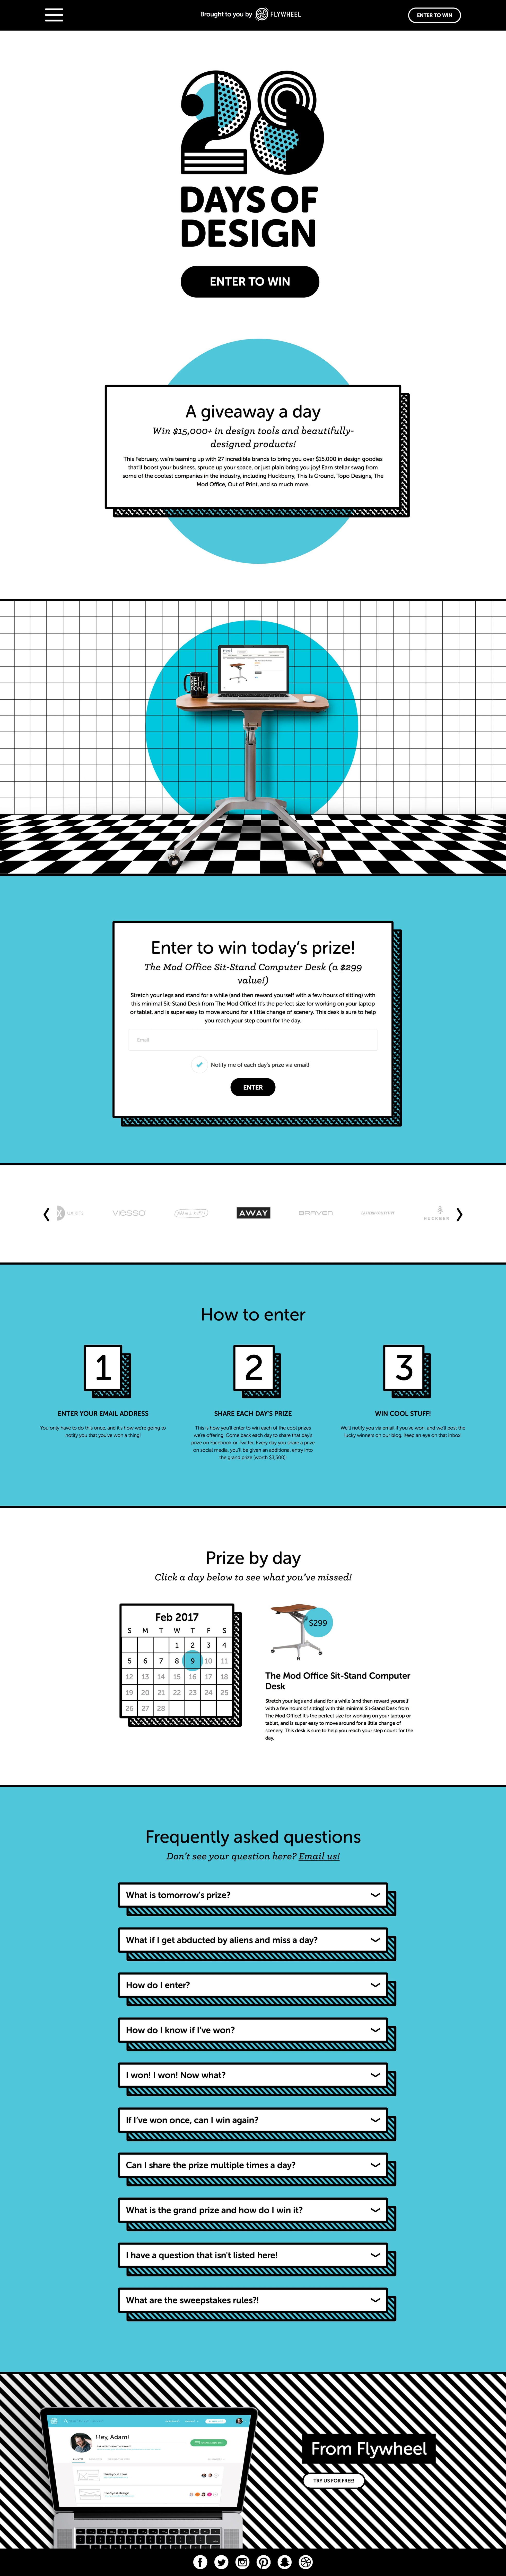 28 Days of Design Website Screenshot